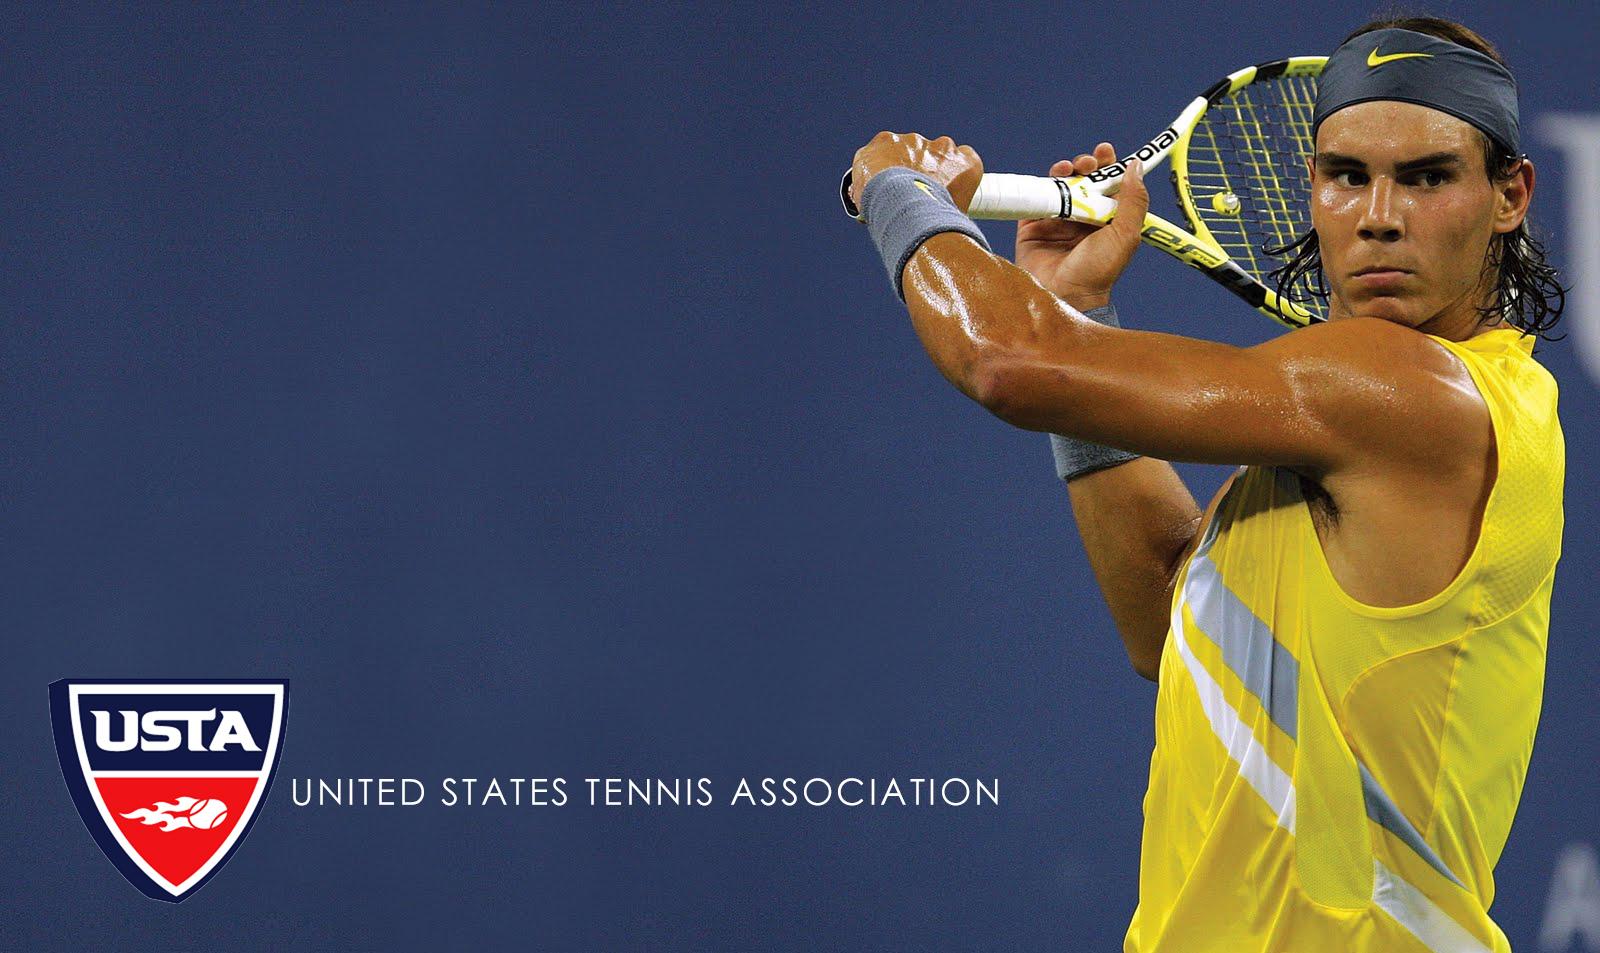 USTA_Nadal_Thumbnail.jpg